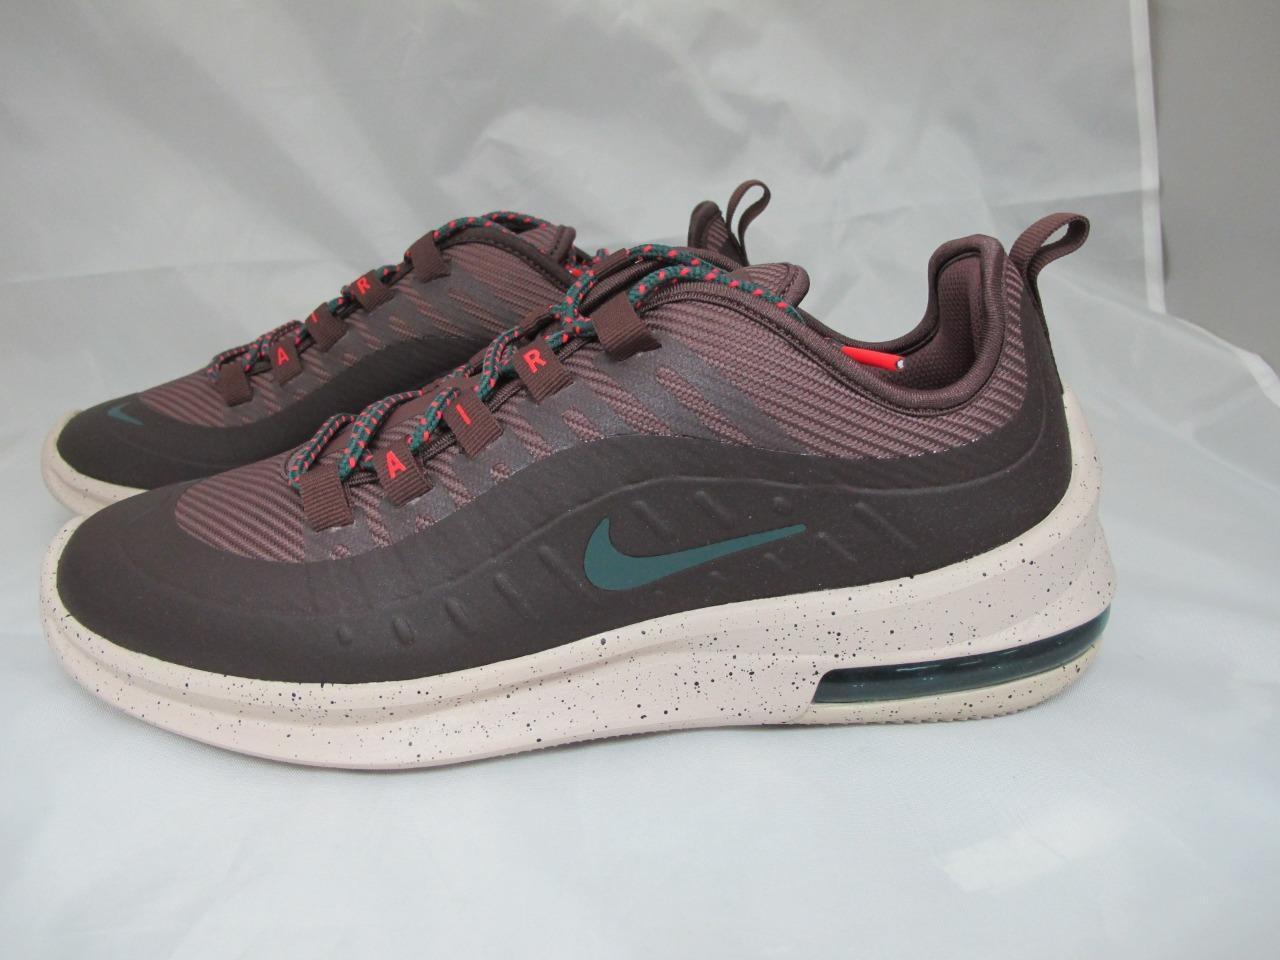 Turnschuhe | Metcon 4 XD Black|White Nike Damen ~ SGJugend